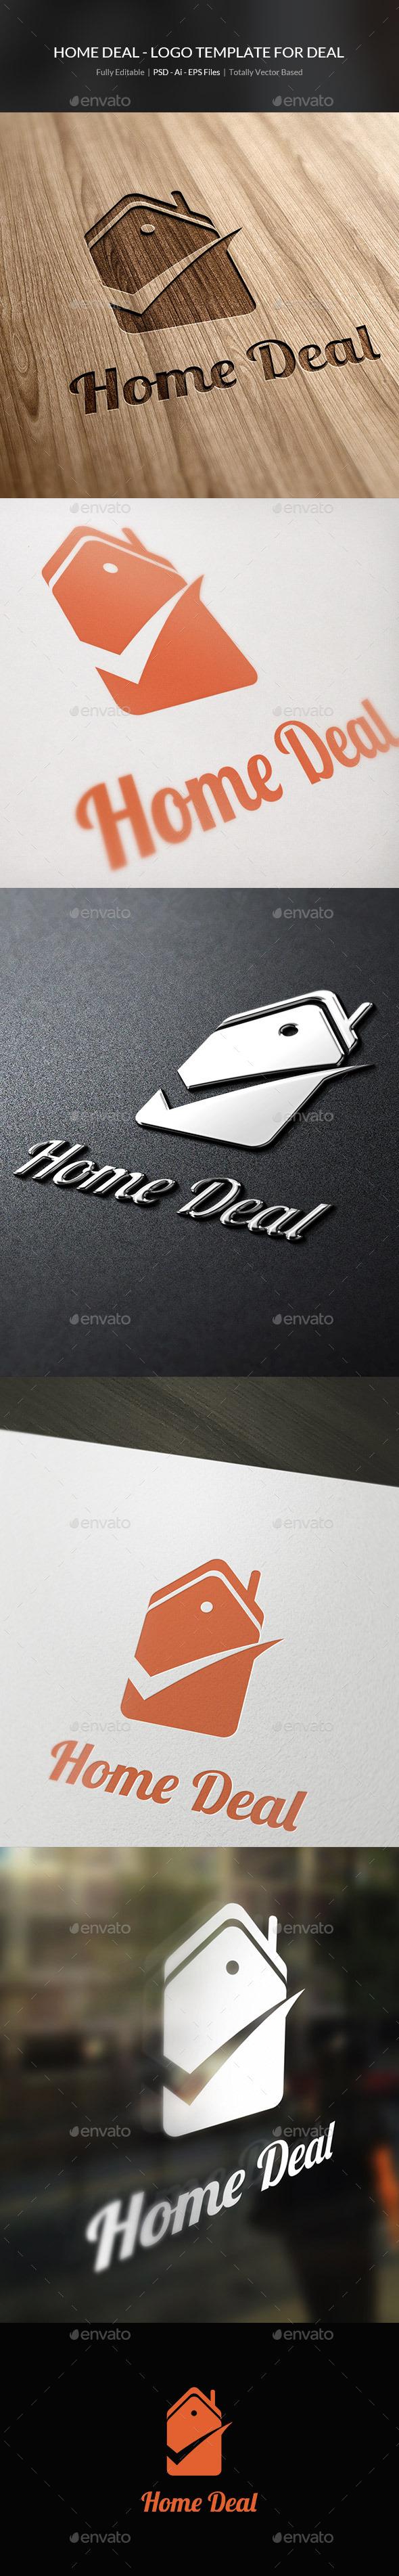 Home Deal Logo Template - Buildings Logo Templates